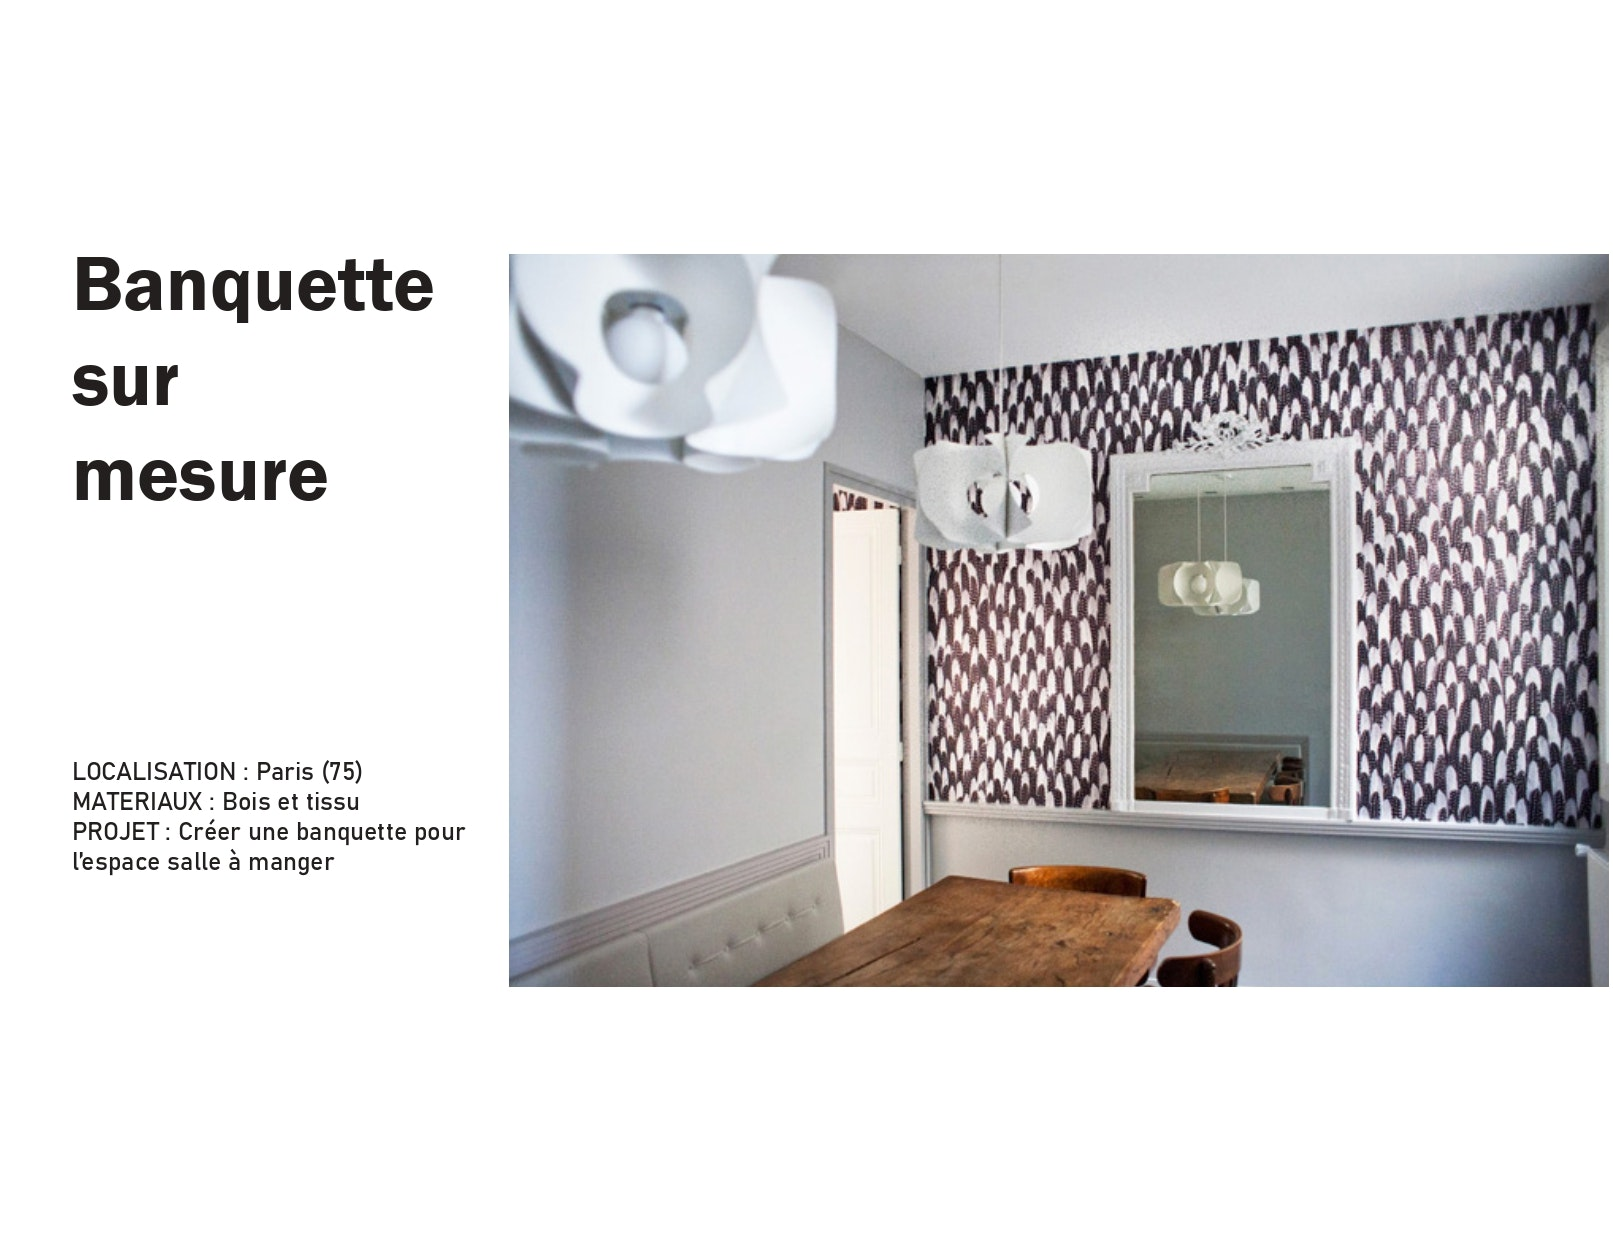 photo Banquette sur mesure Manon Le Gall - Architecte hemea